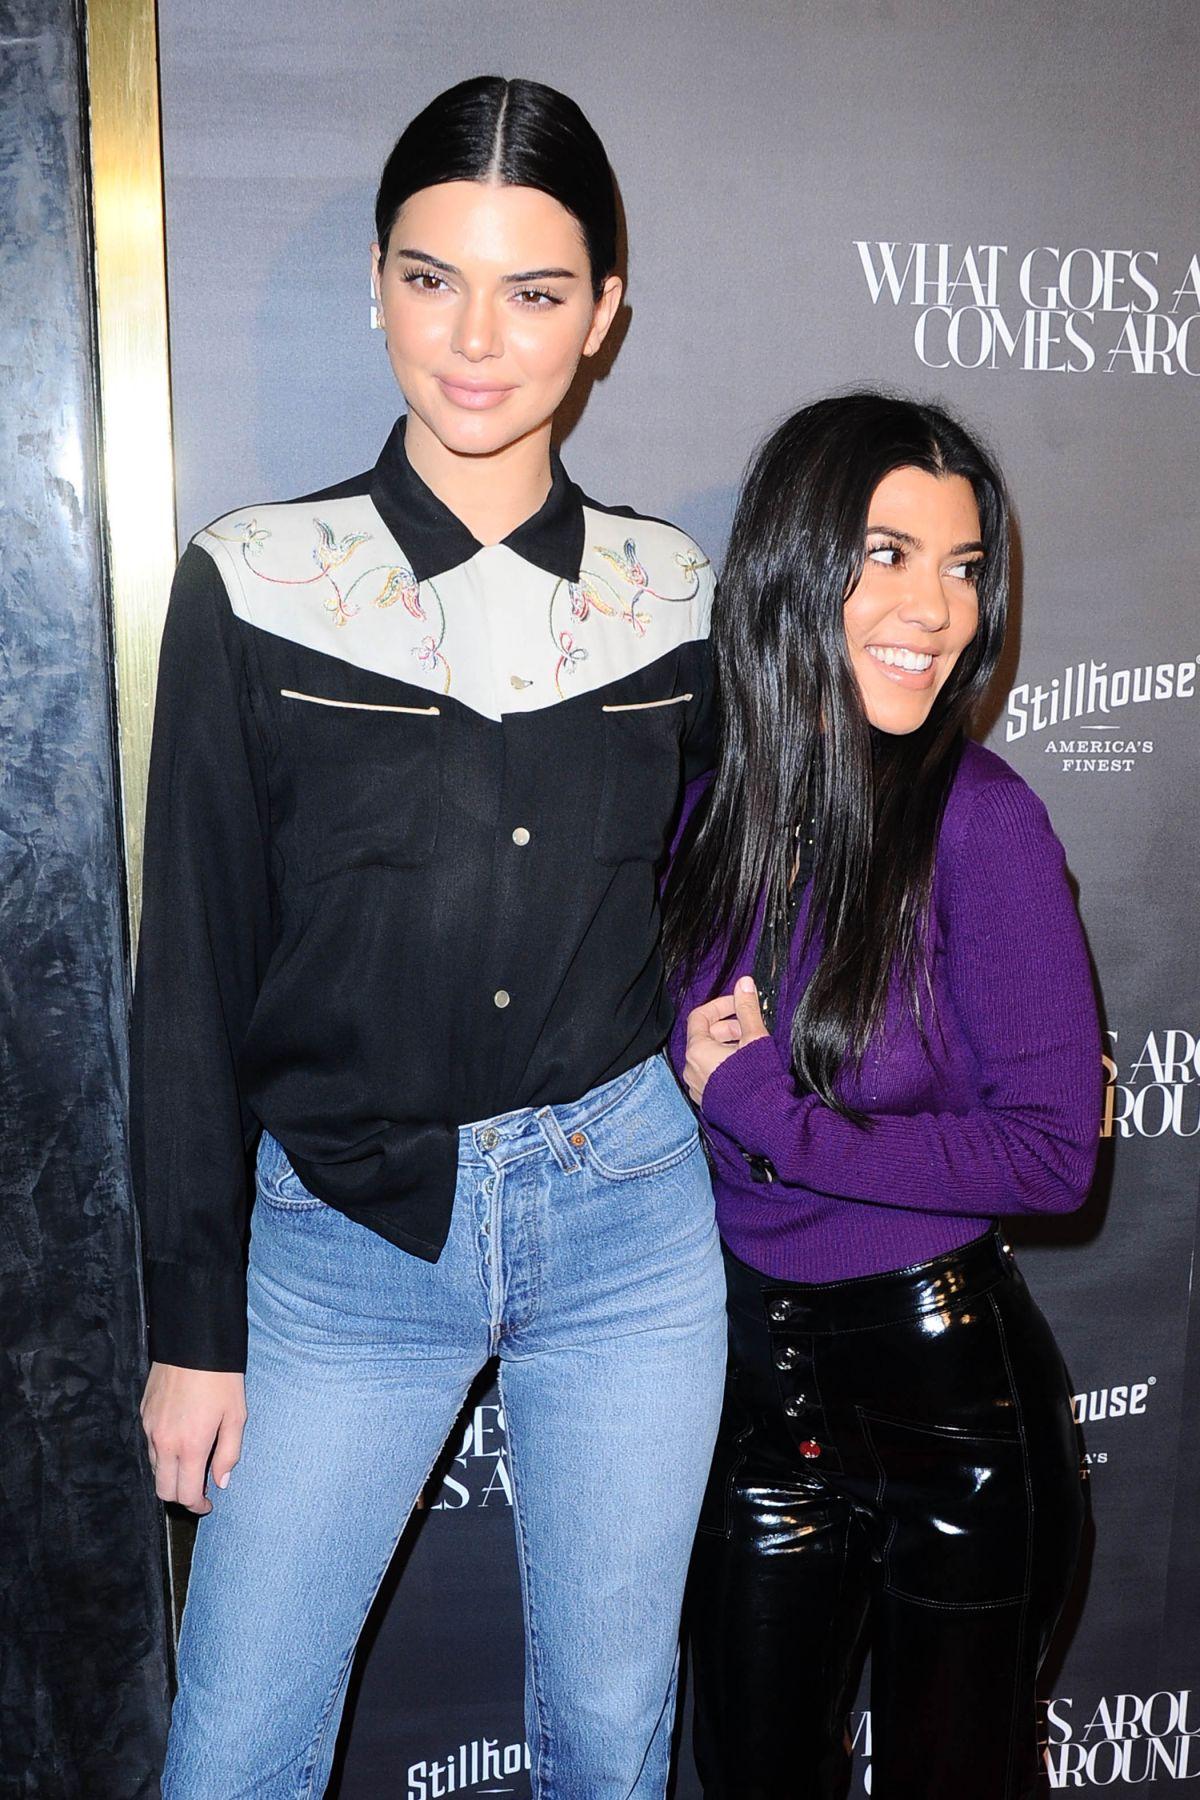 kendall jenner and kourtney kardashian at what goes around